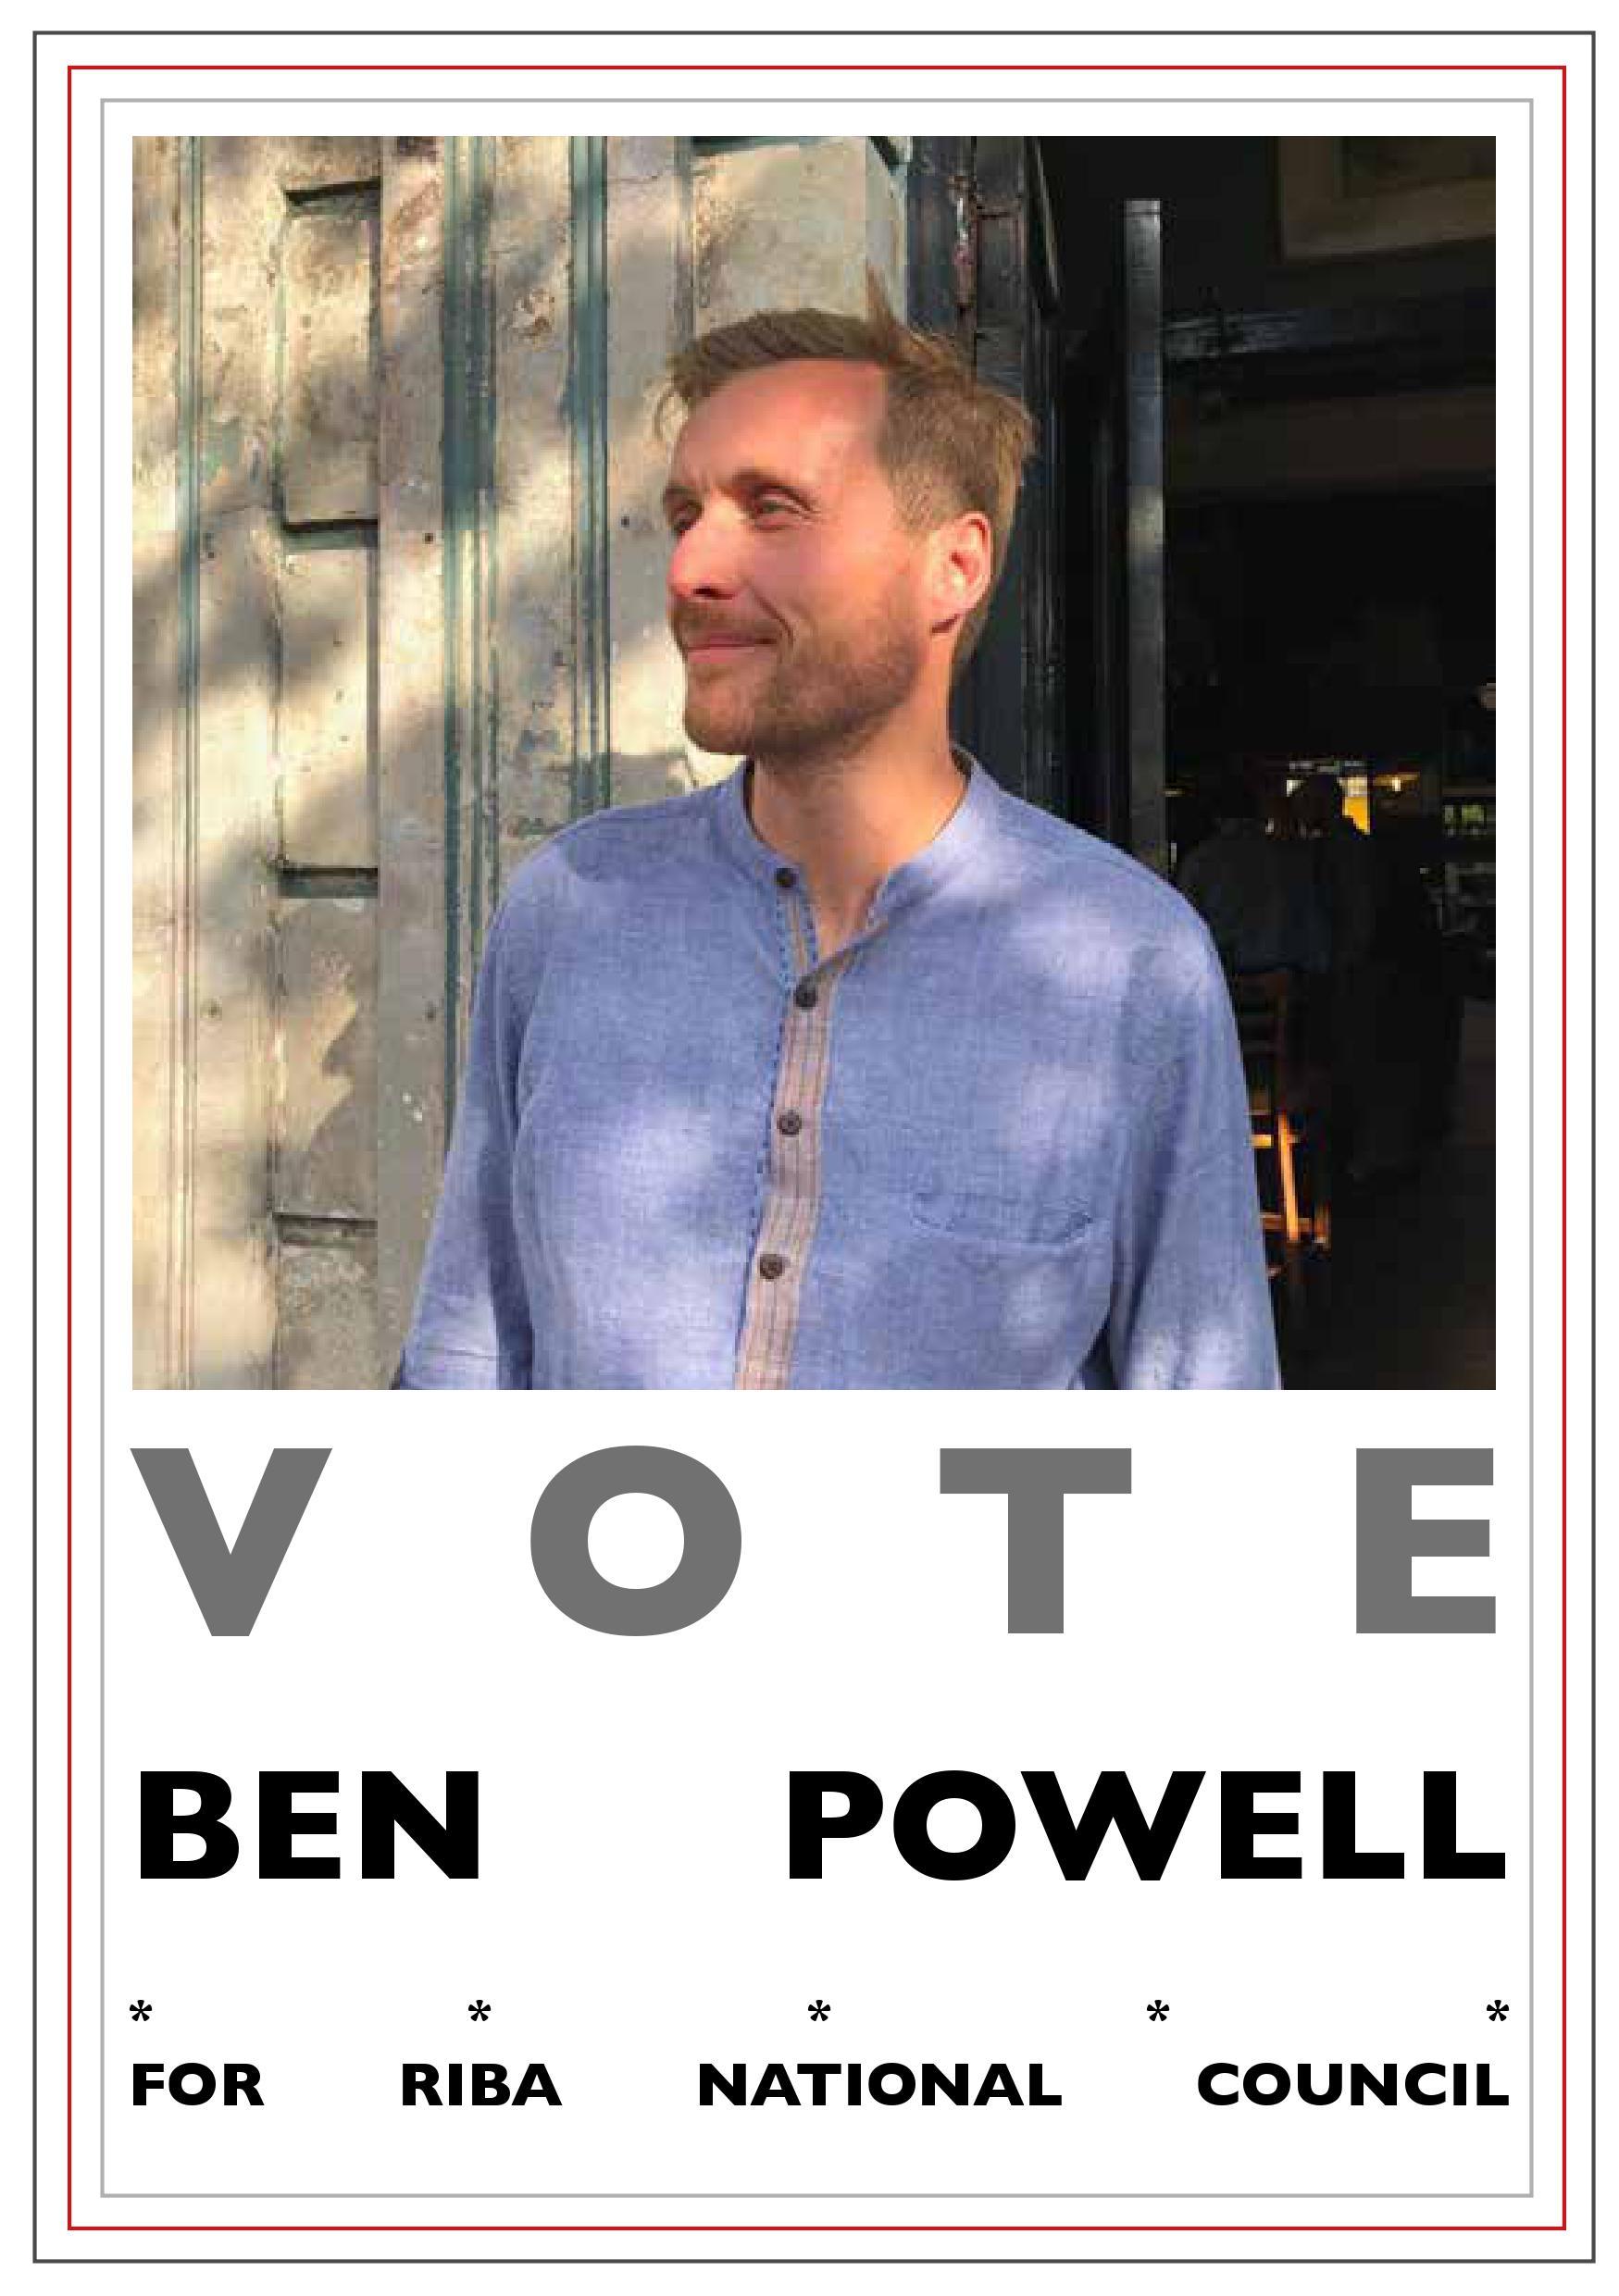 Vote Ben Powell_page 1.jpg